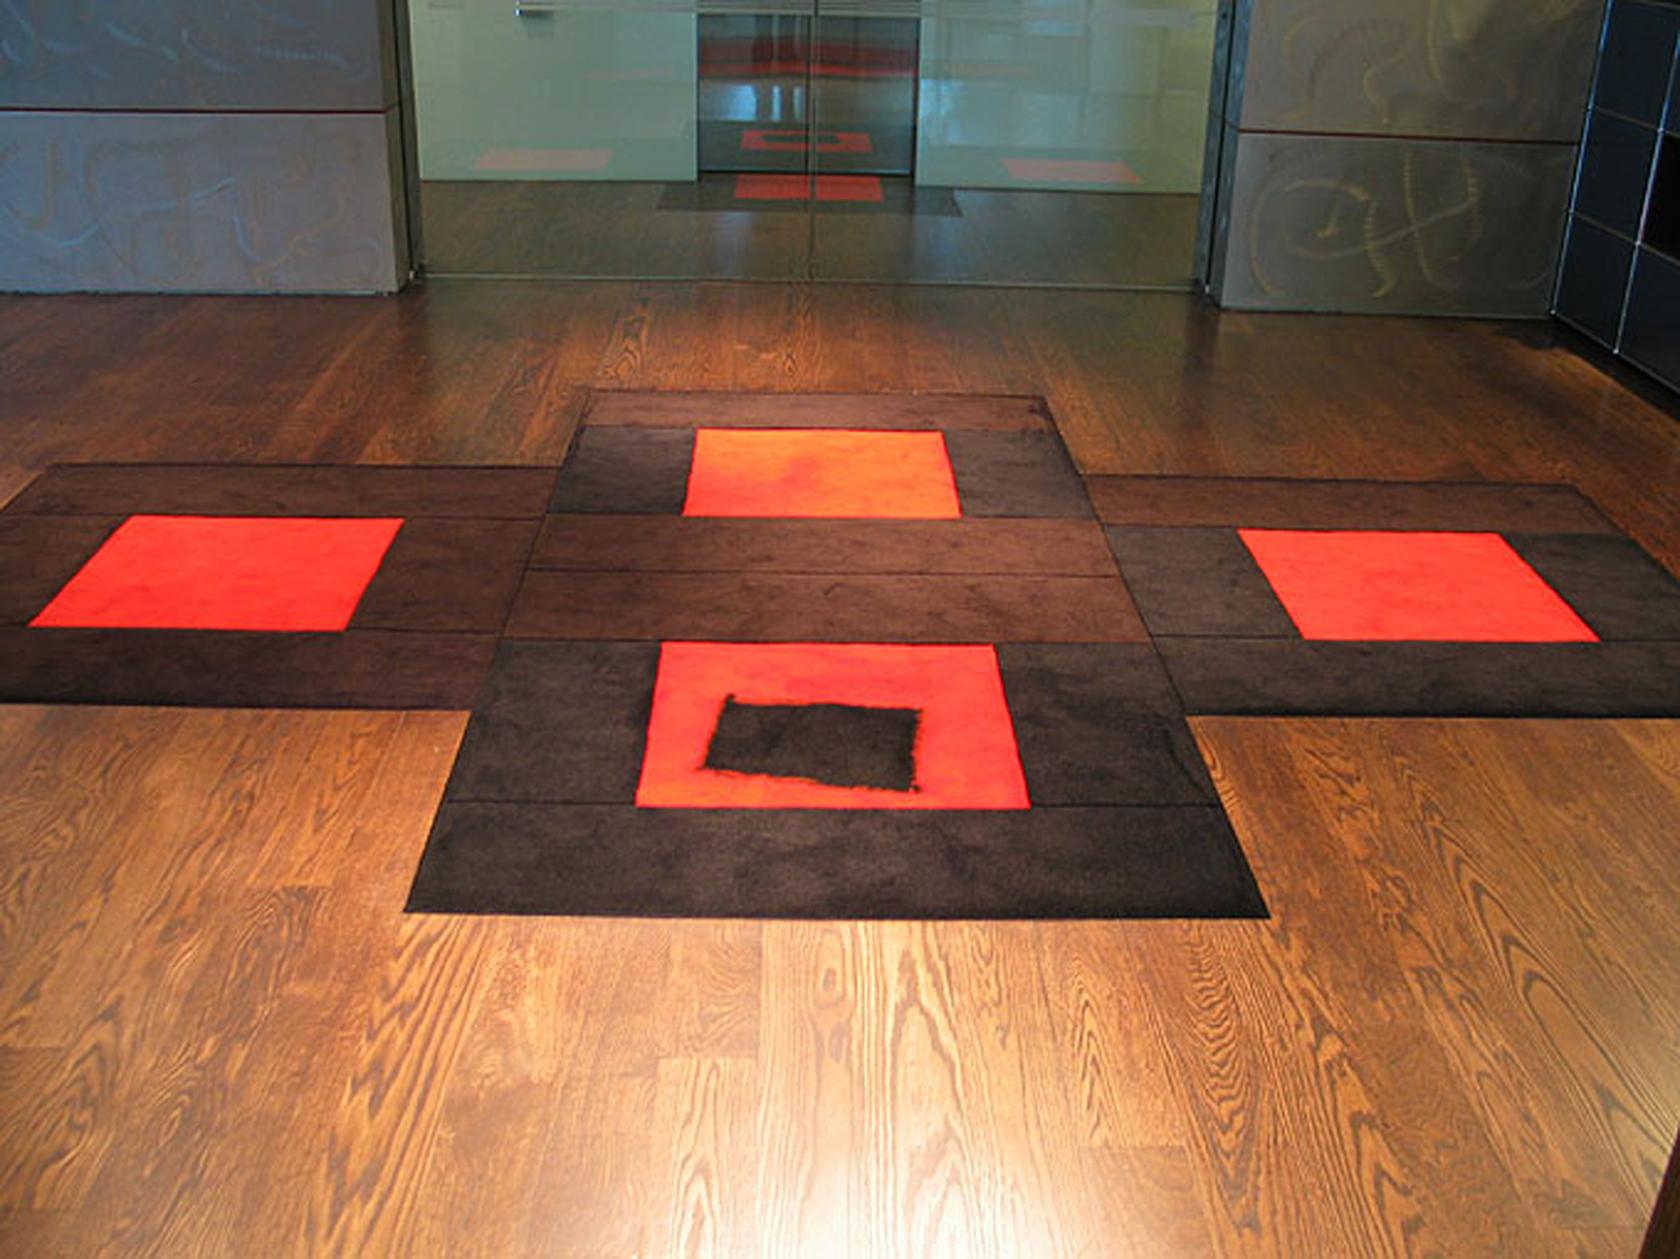 Black Cross Red Square   design Ralph Hotere